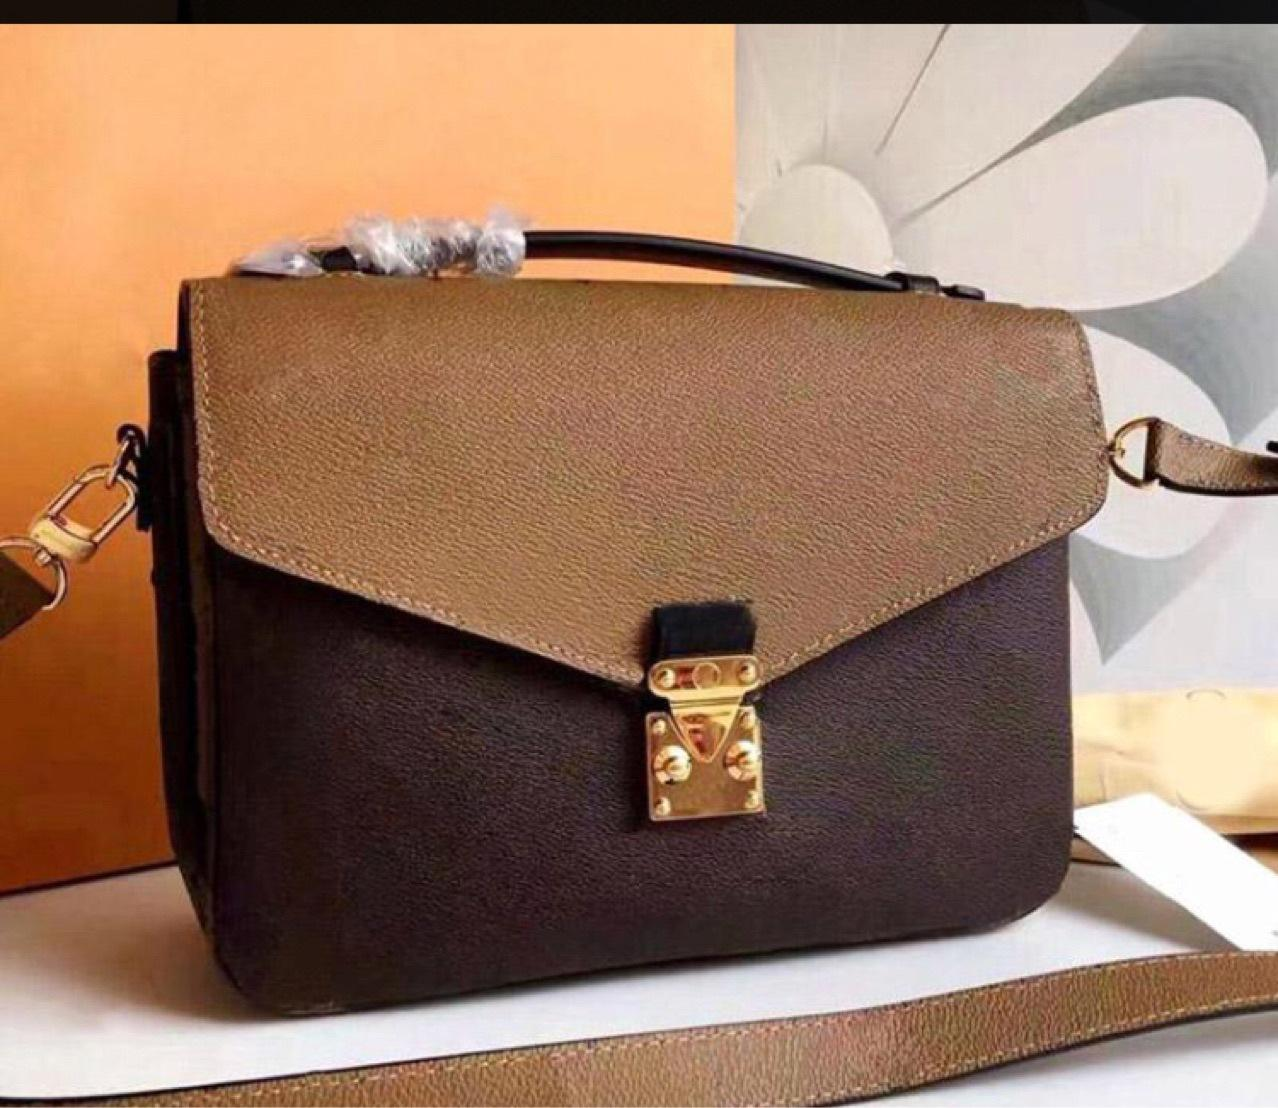 Orenginale Genuine Pelle Designer Cross Body Messenger Bag Girls Lady Donne Donne Satchel Borsa a mano Presboopic Mini Borsa a tracolla